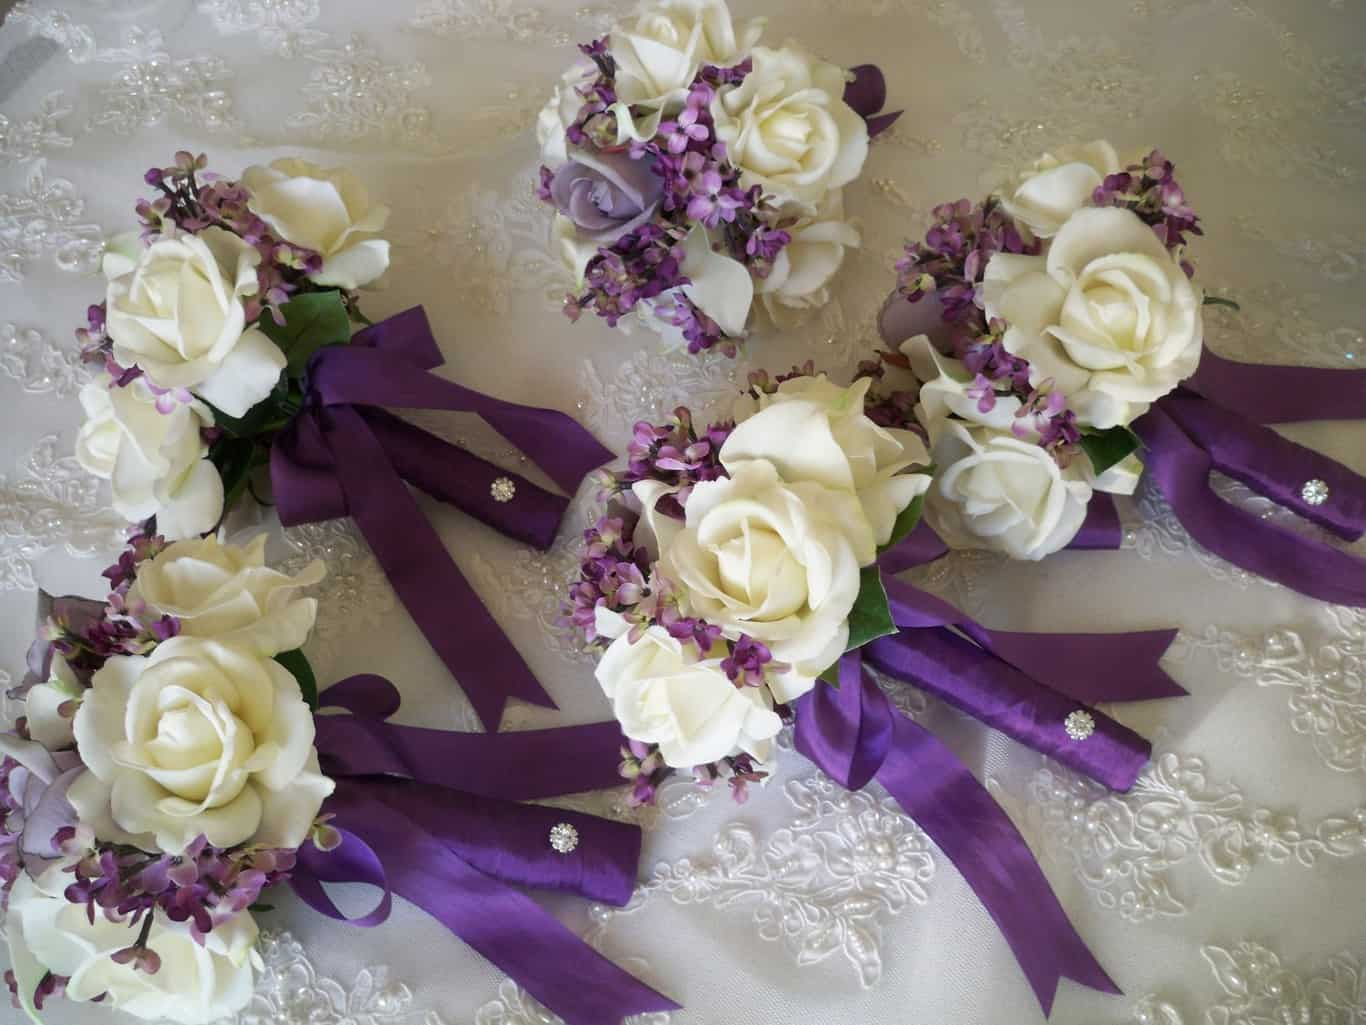 Wedding Flower Budget & Rental Items